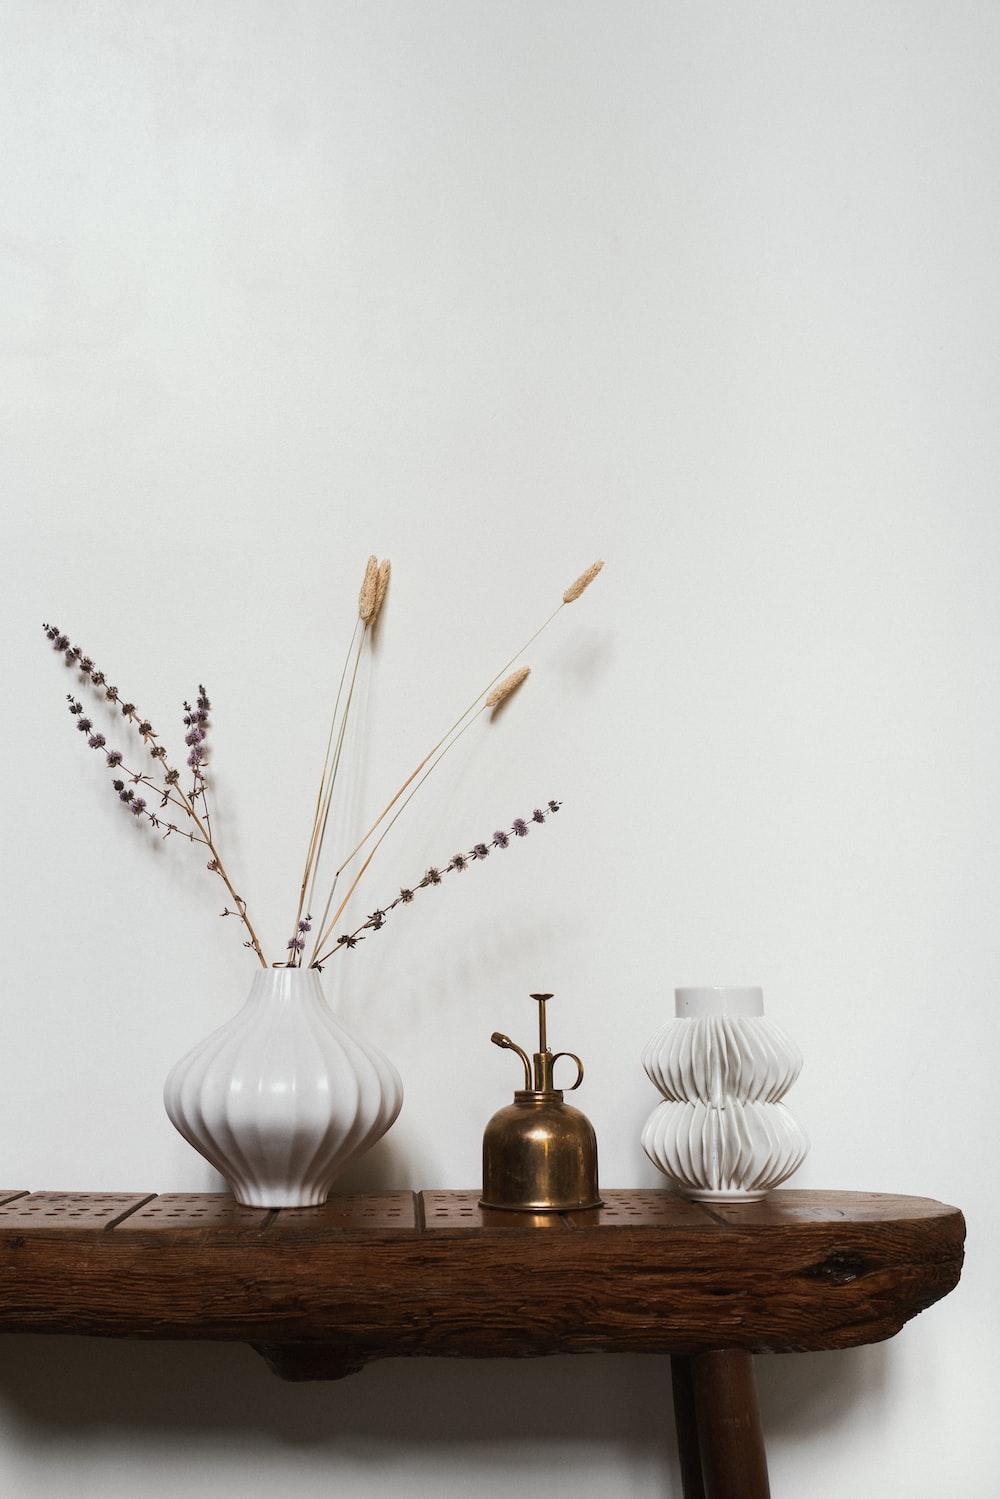 white ceramic vase with brown wooden sticks